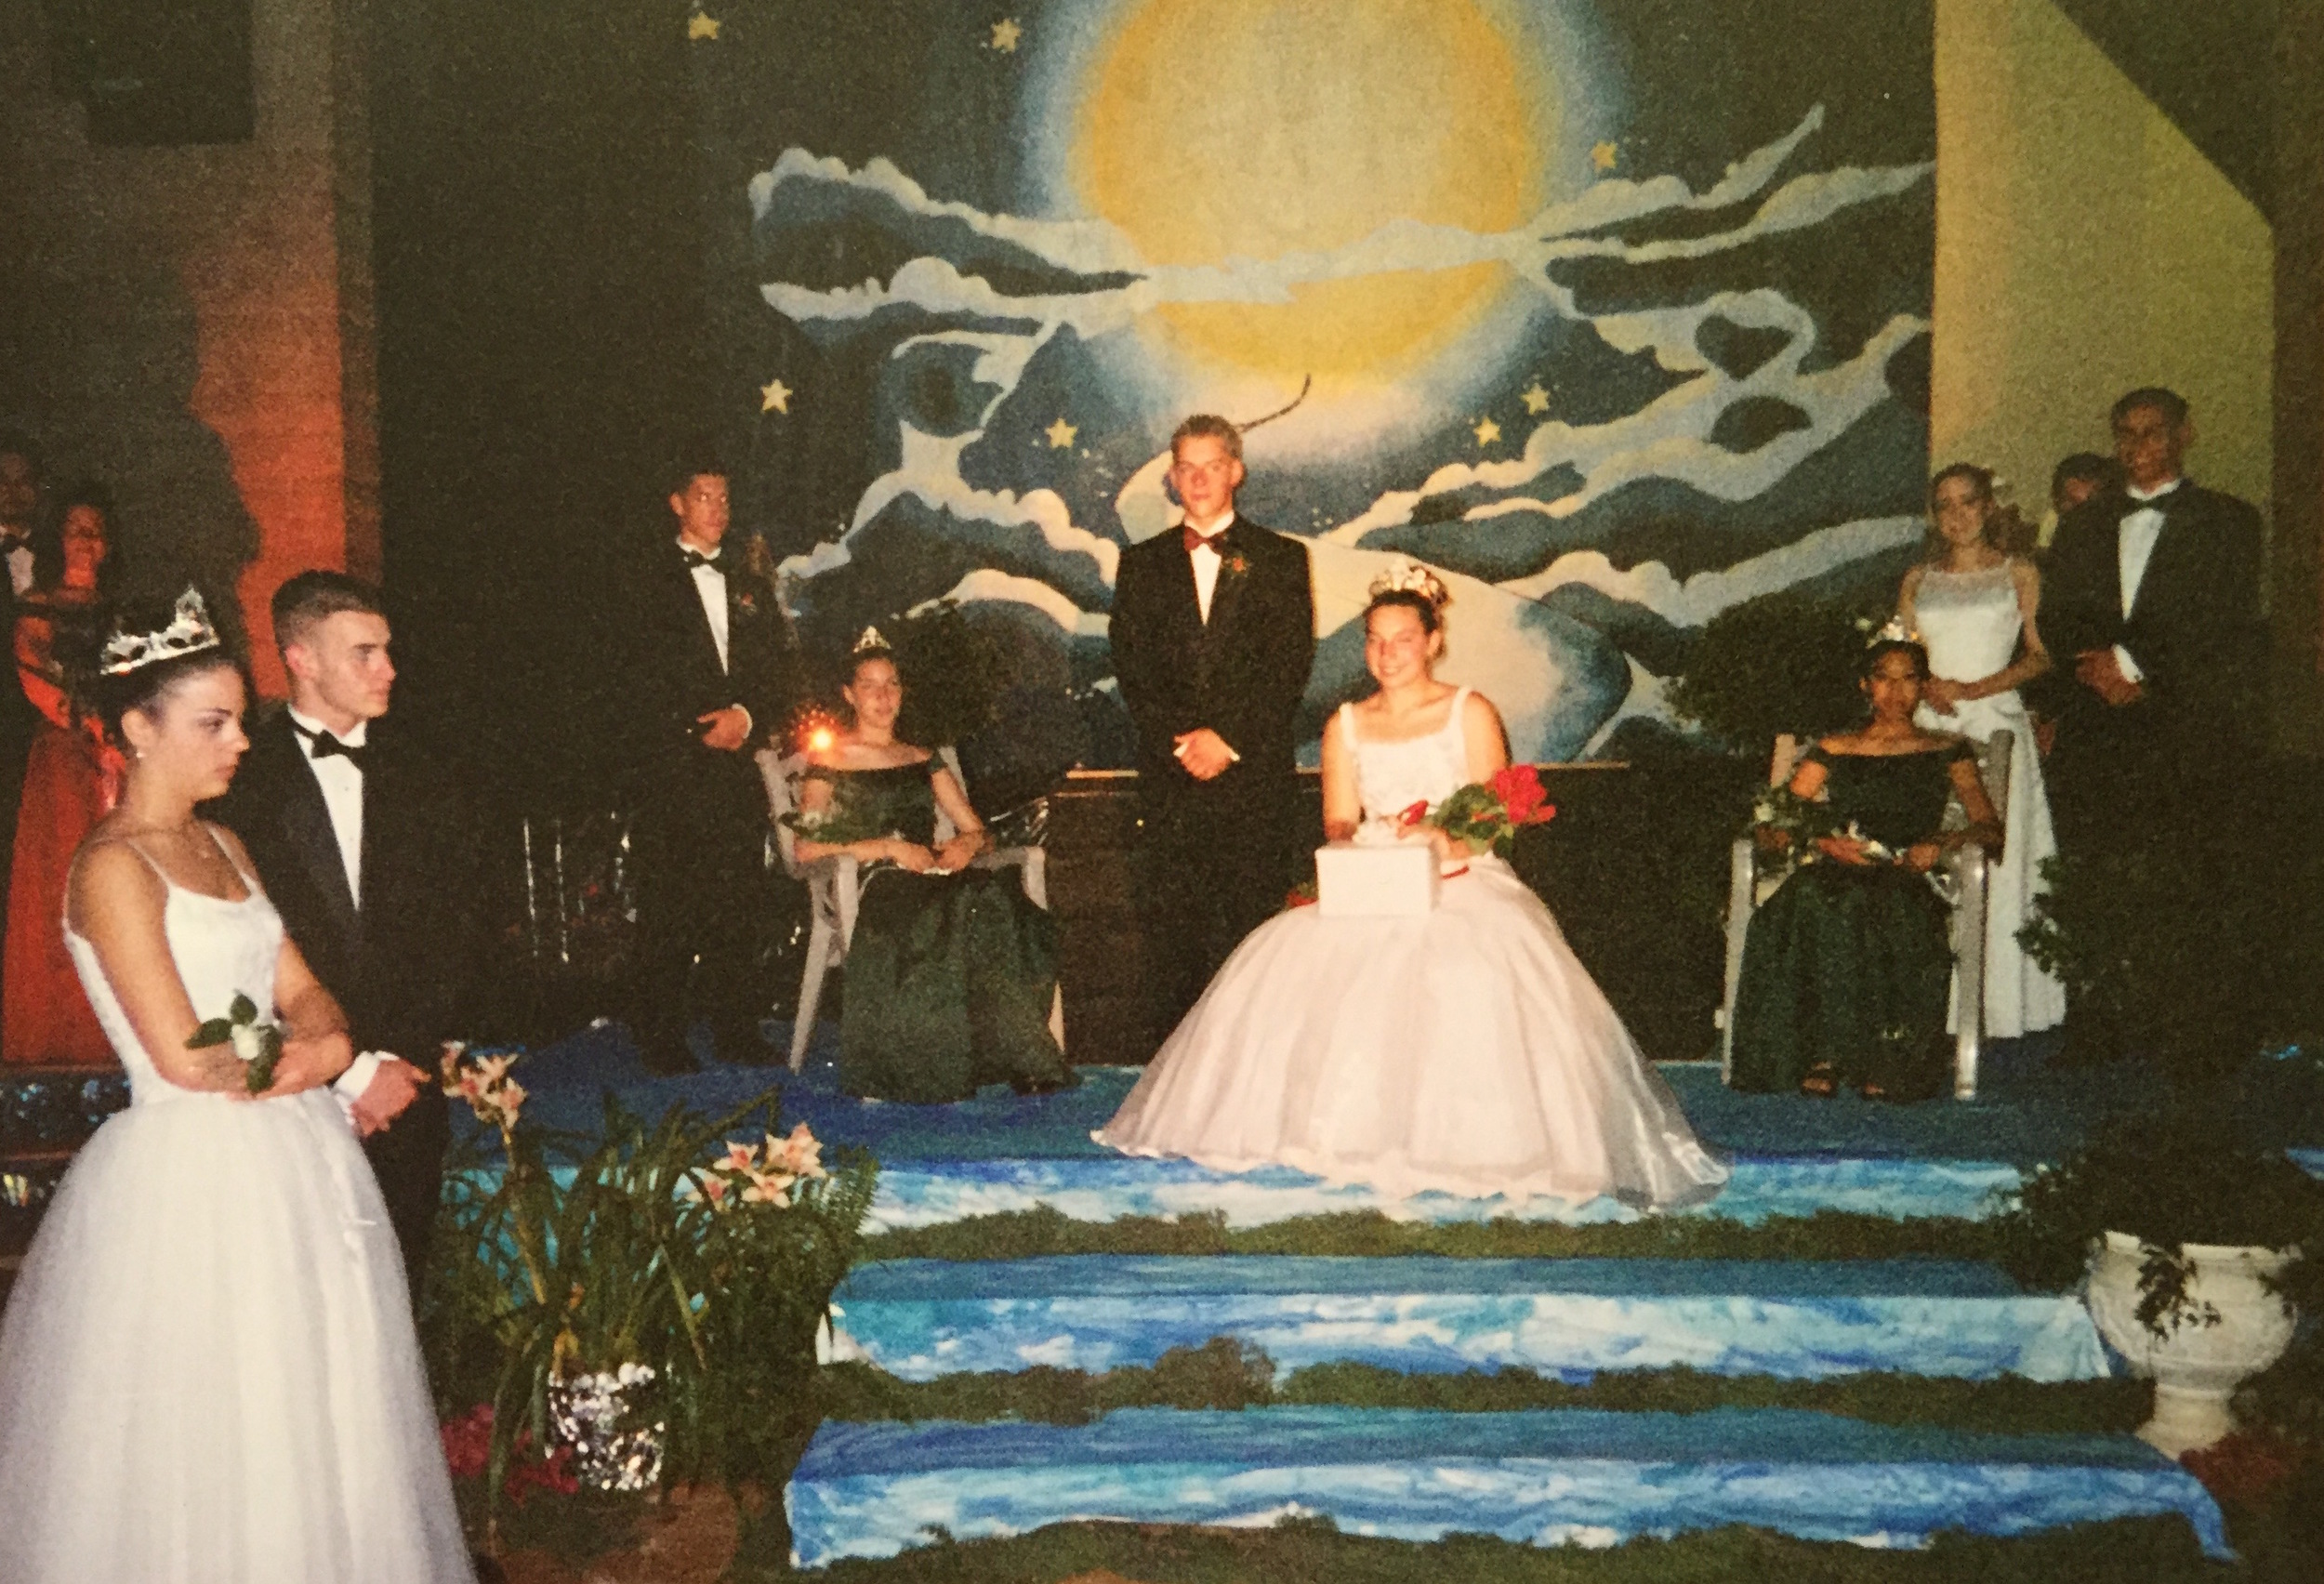 2000 Festival Queen   - Rebecca Gentrup   Sidemaids - Rebecca Salazar & Stephanie Randazzo